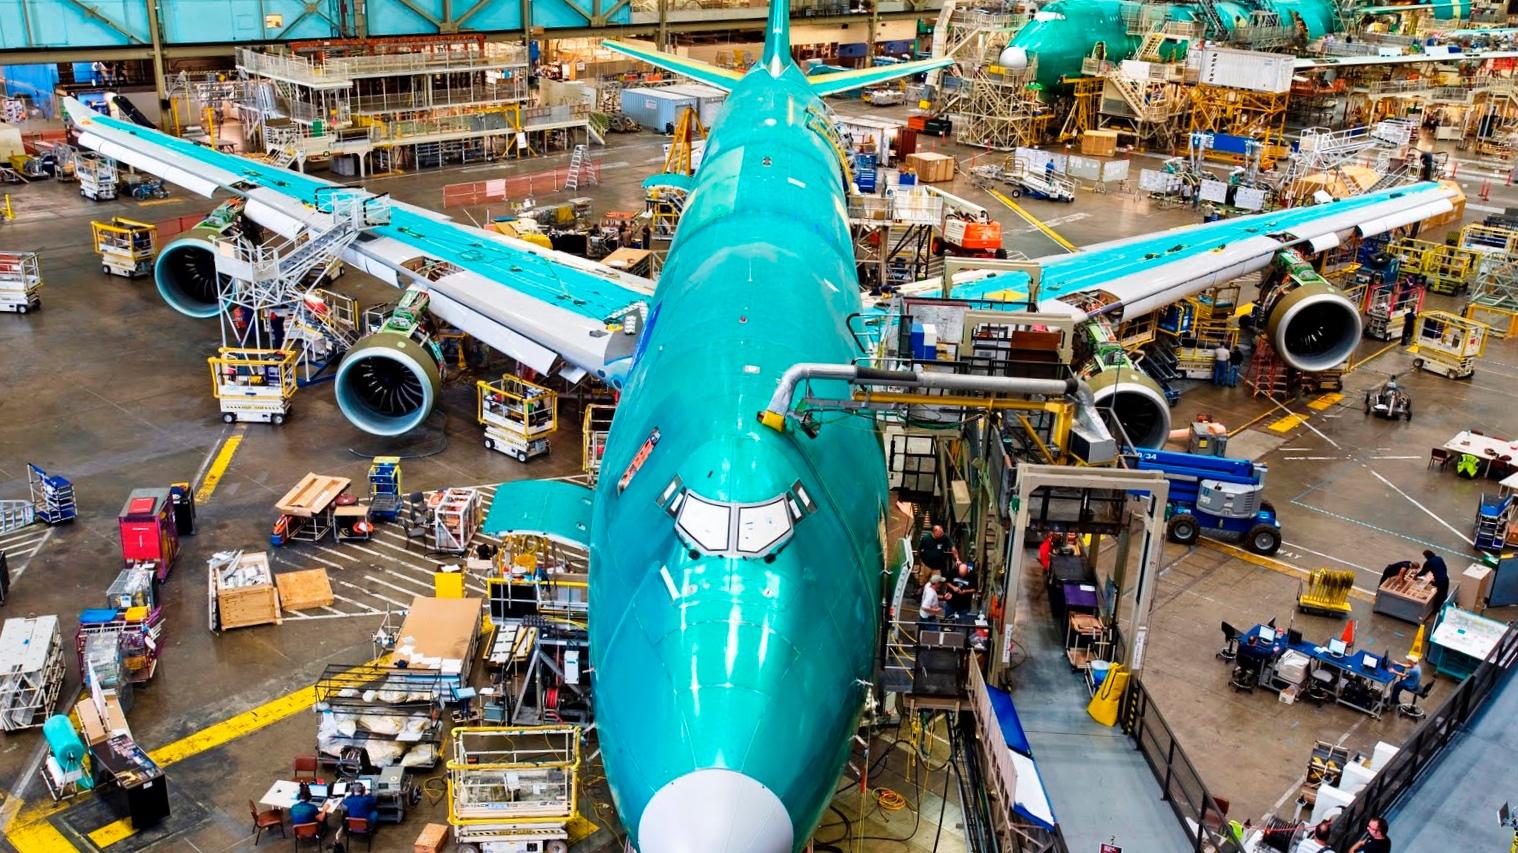 Cougartron-aerospace-industry.jpg